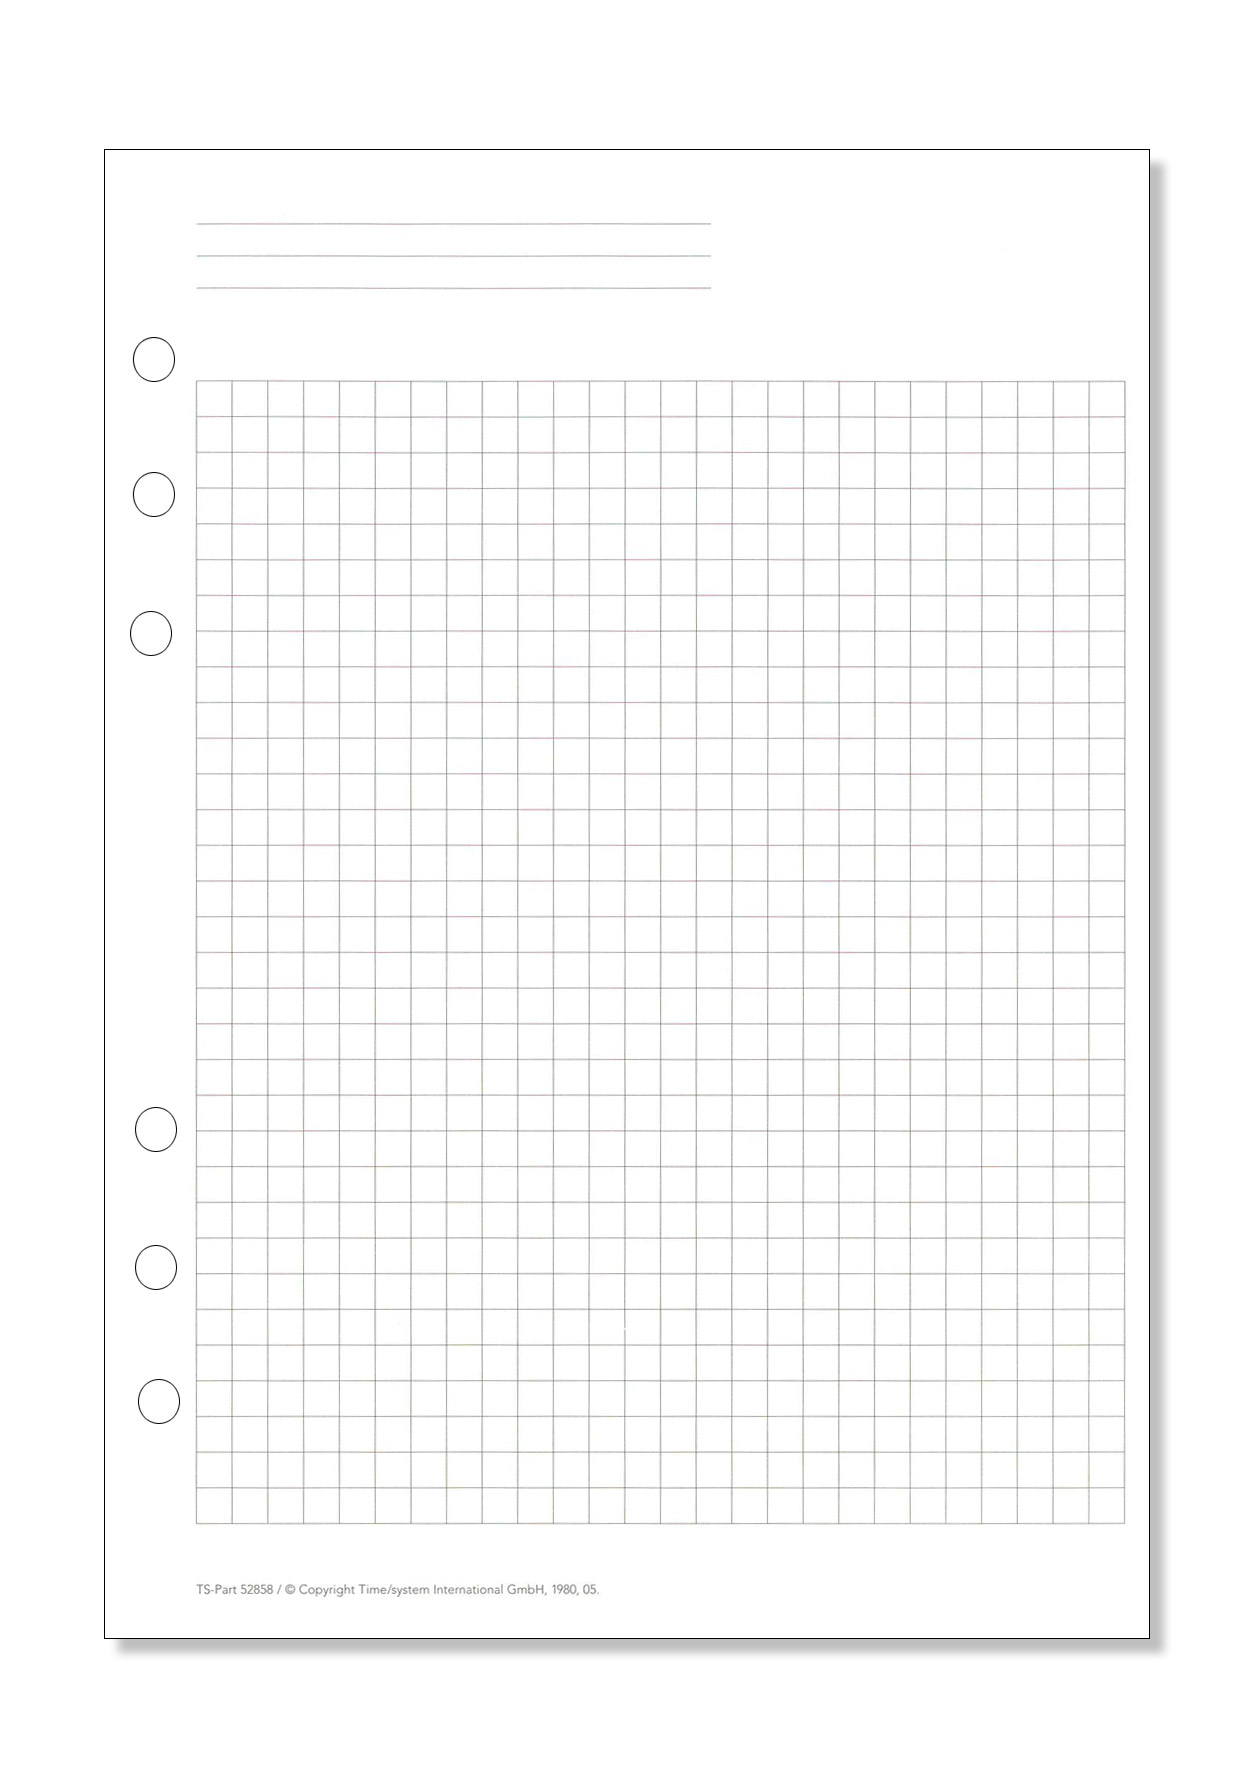 Time/system A5 Formblatt Kariertes Papier ganzes Kariertes Papier Pdf